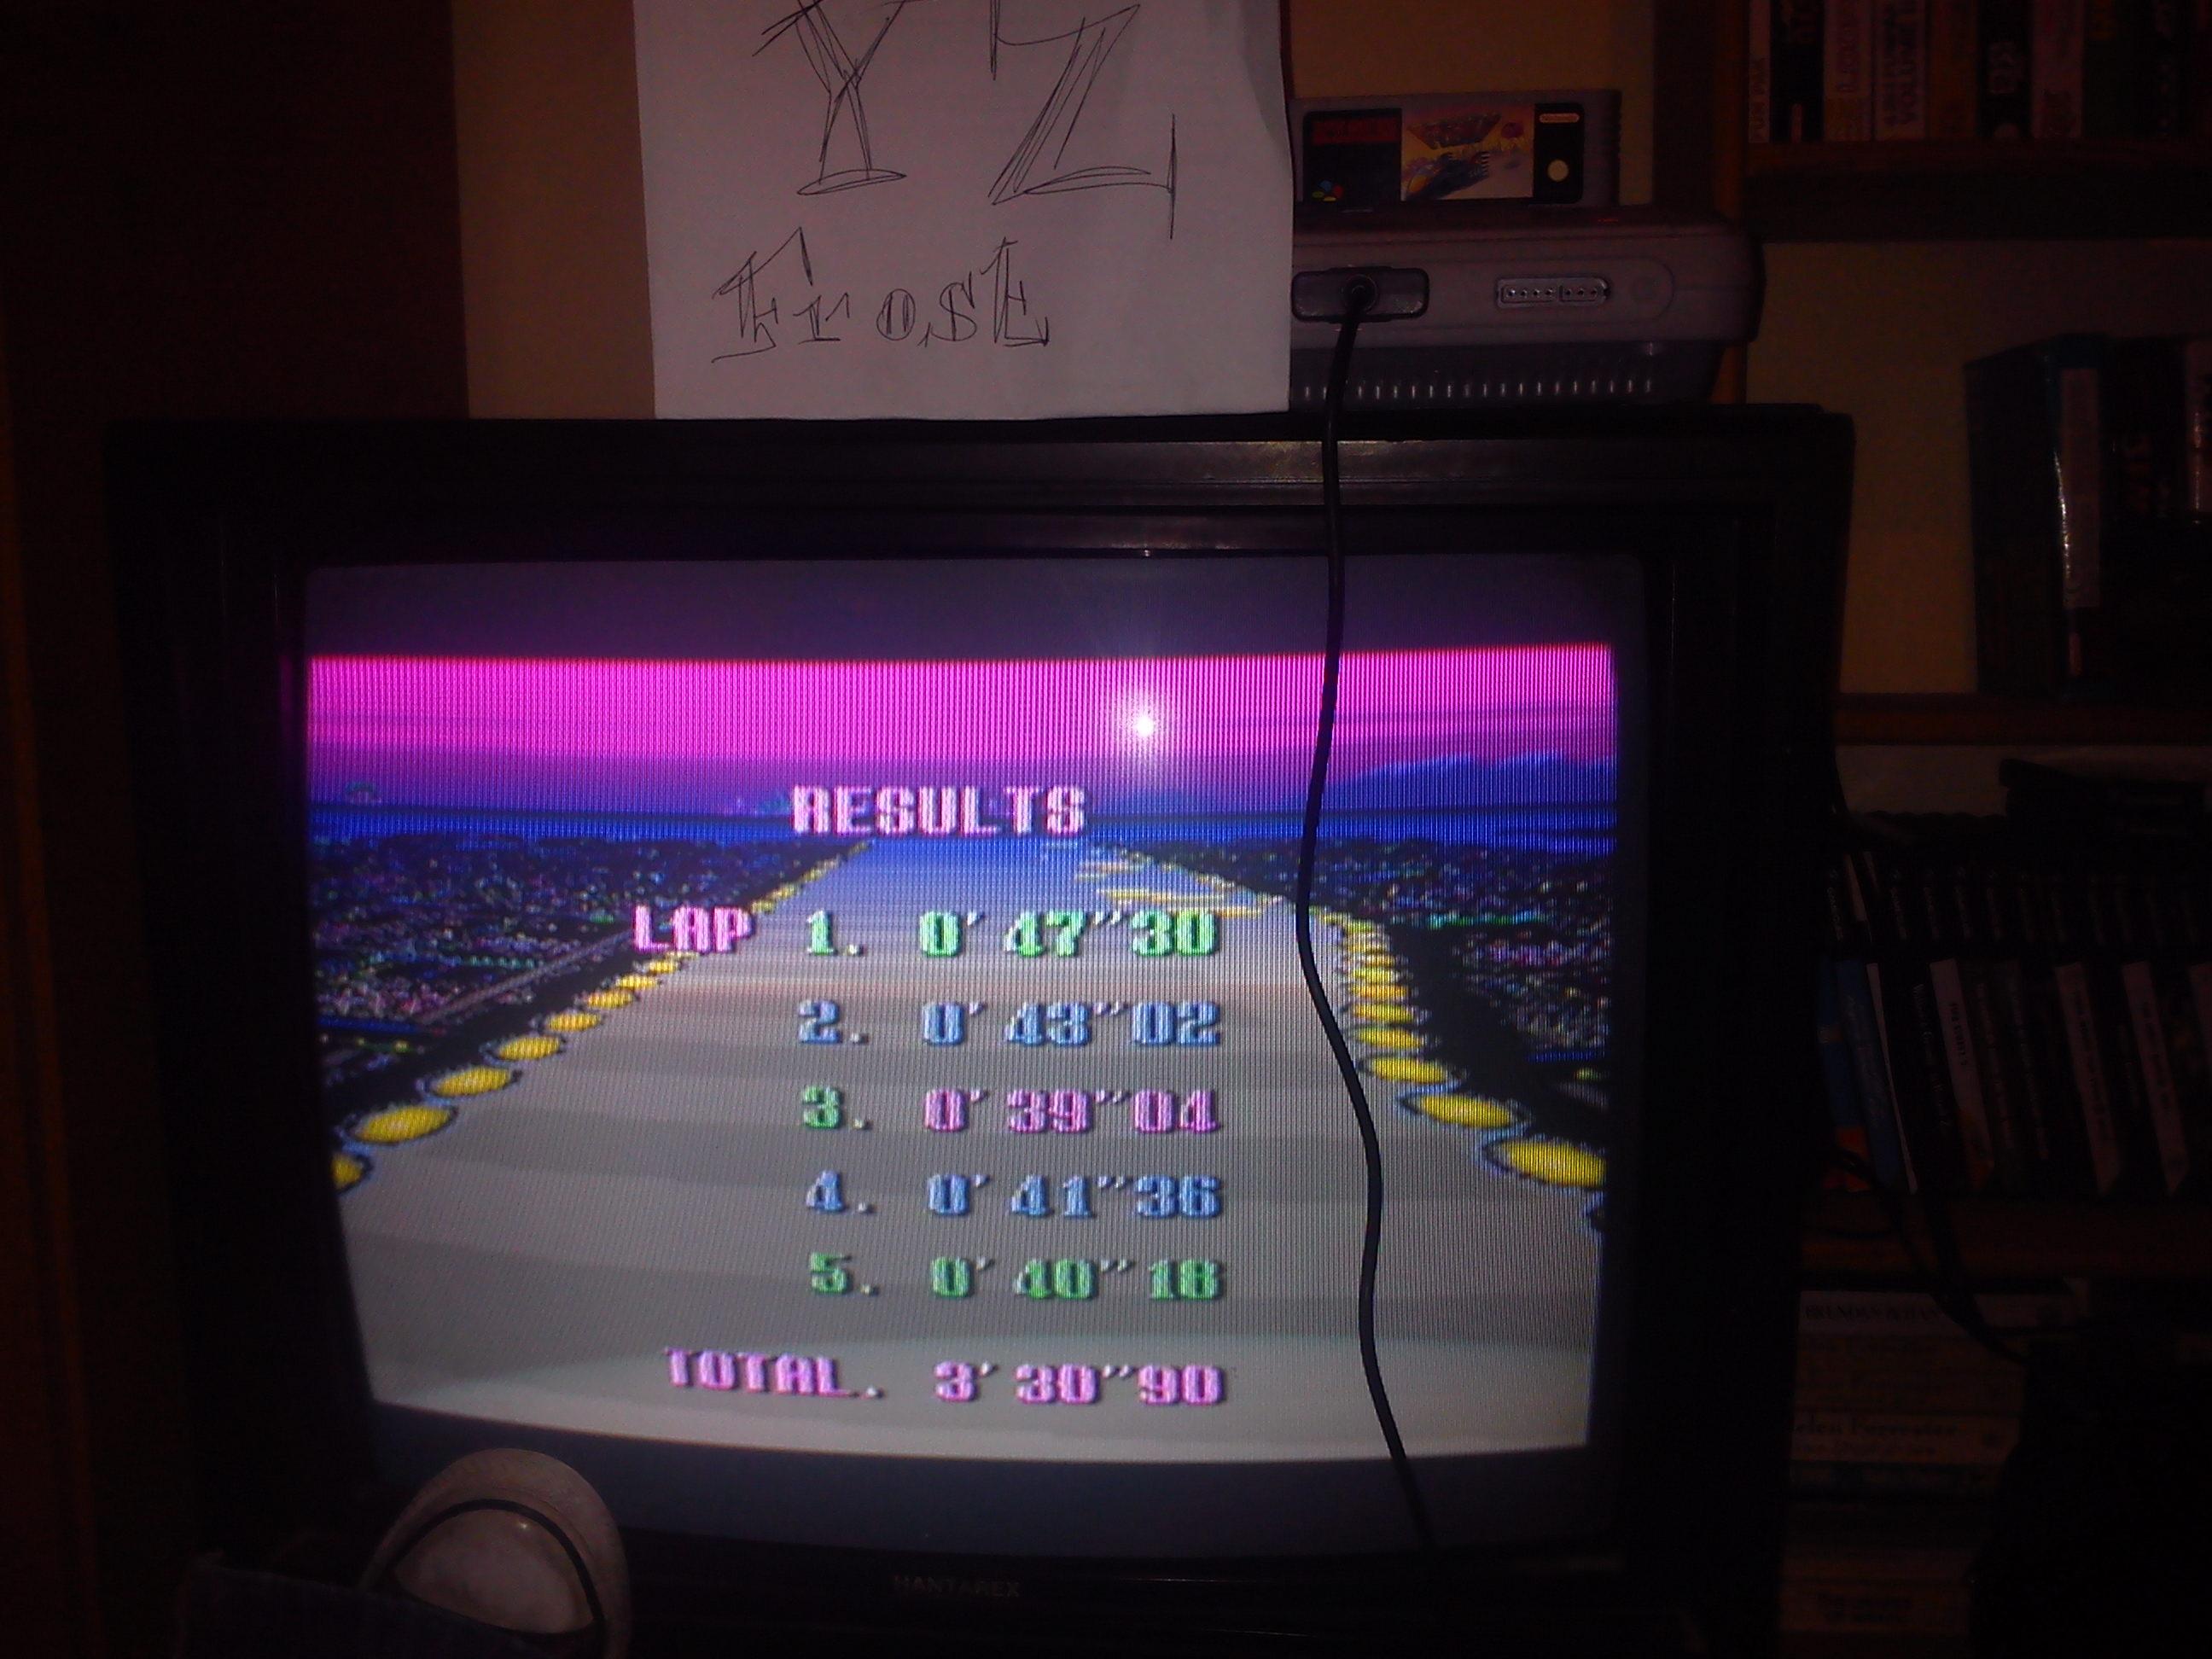 Fr0st: F-Zero: Port Town II [Beginner] (SNES/Super Famicom) 0:03:30.9 points on 2014-11-03 18:01:35